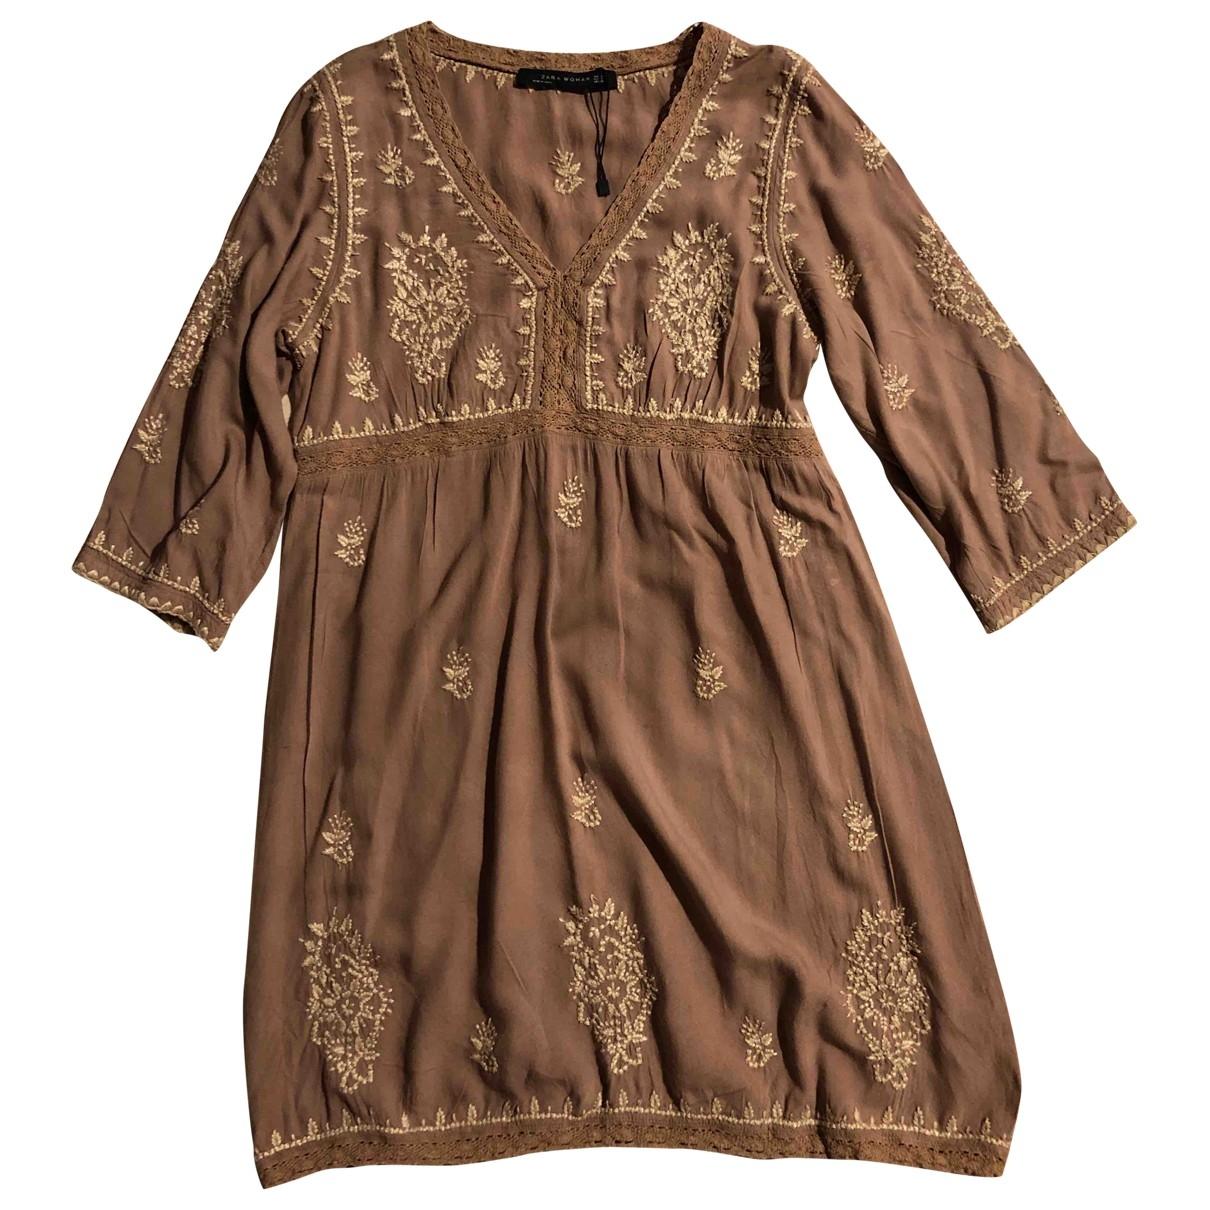 Zara \N Brown Cotton dress for Women S International